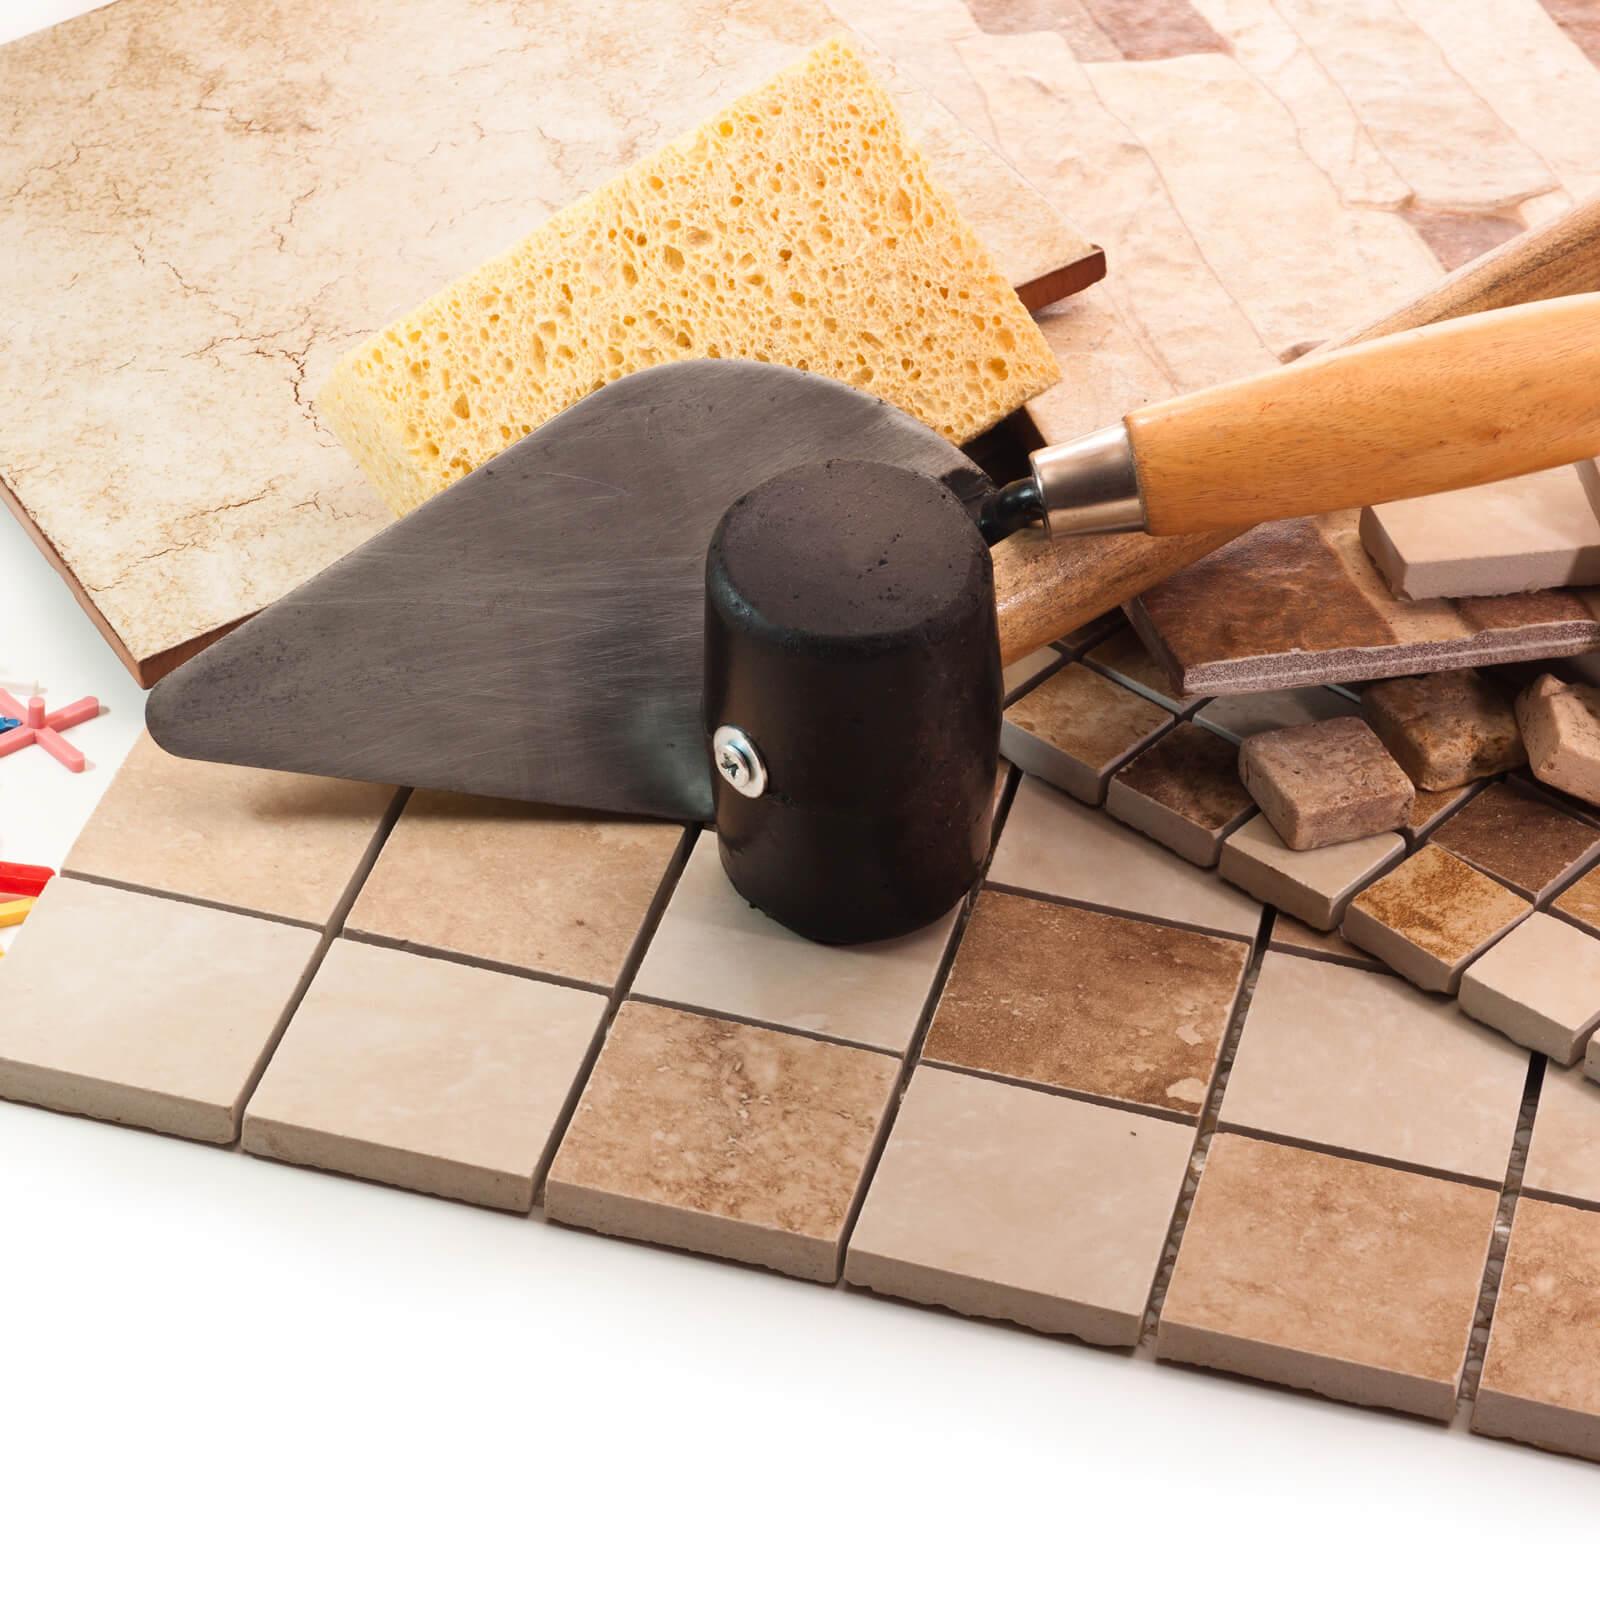 Tile installation | McCool's Flooring